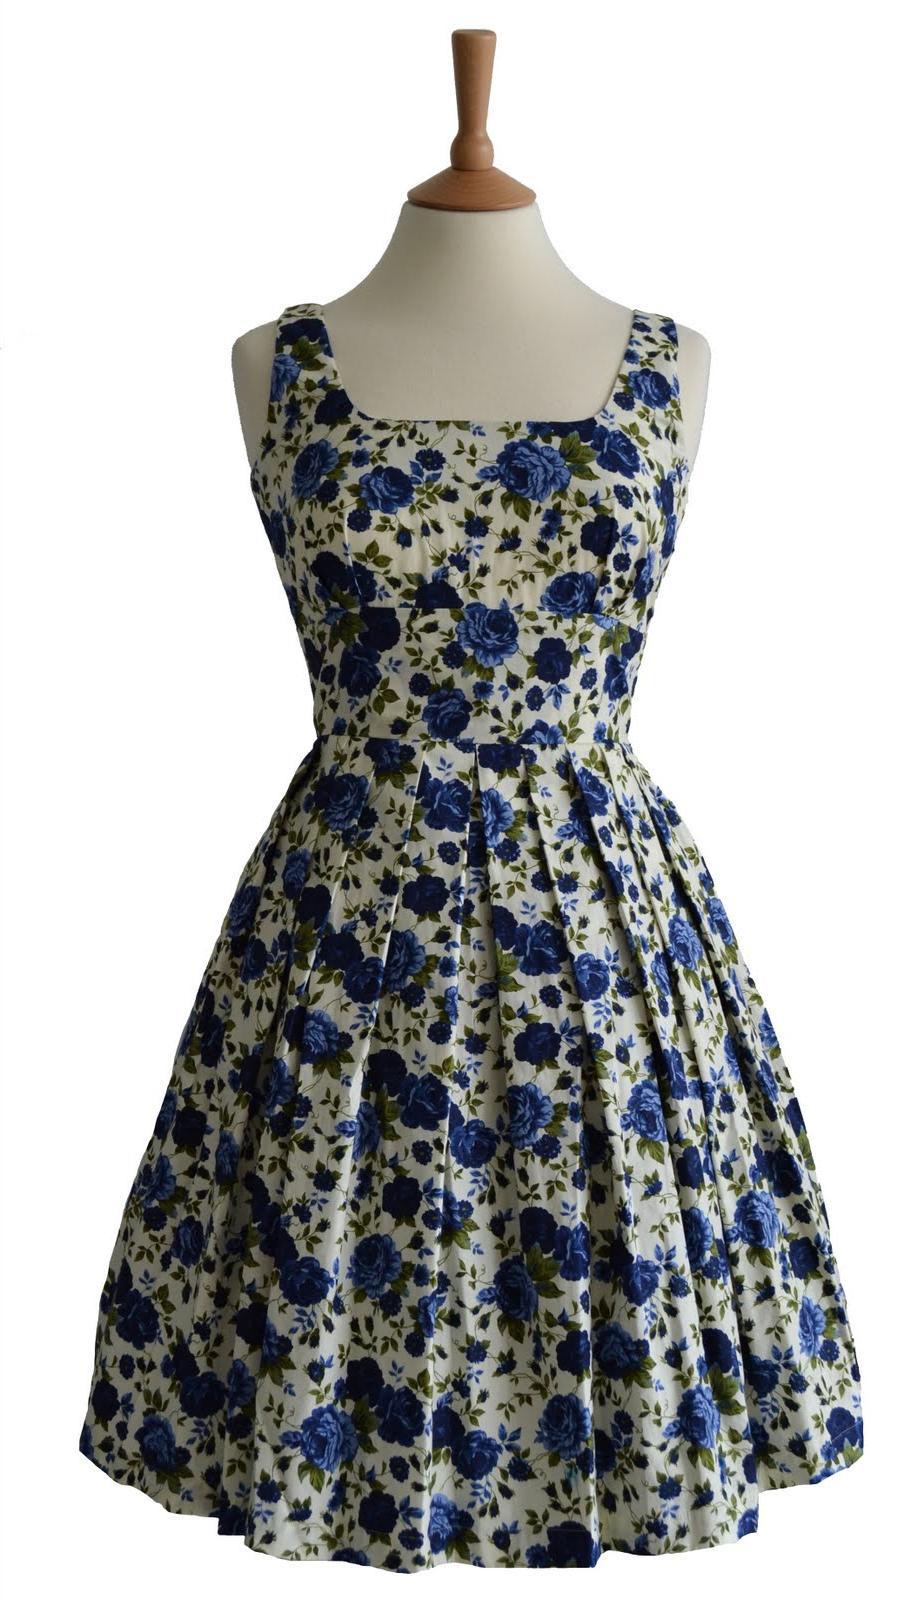 1950s Vintage Style Prom Dress